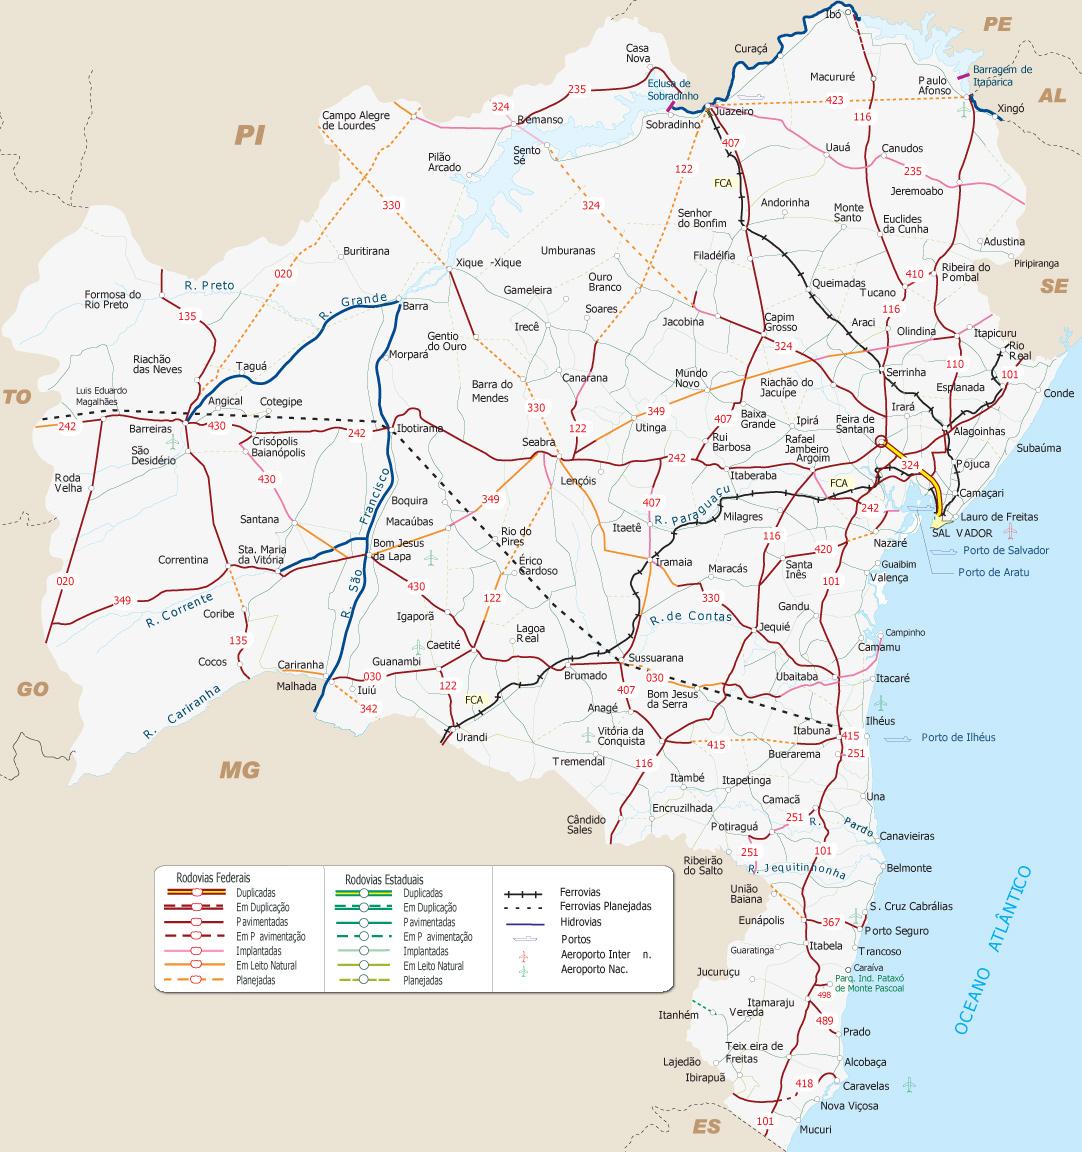 Mapa base: Ministério dos Transportes